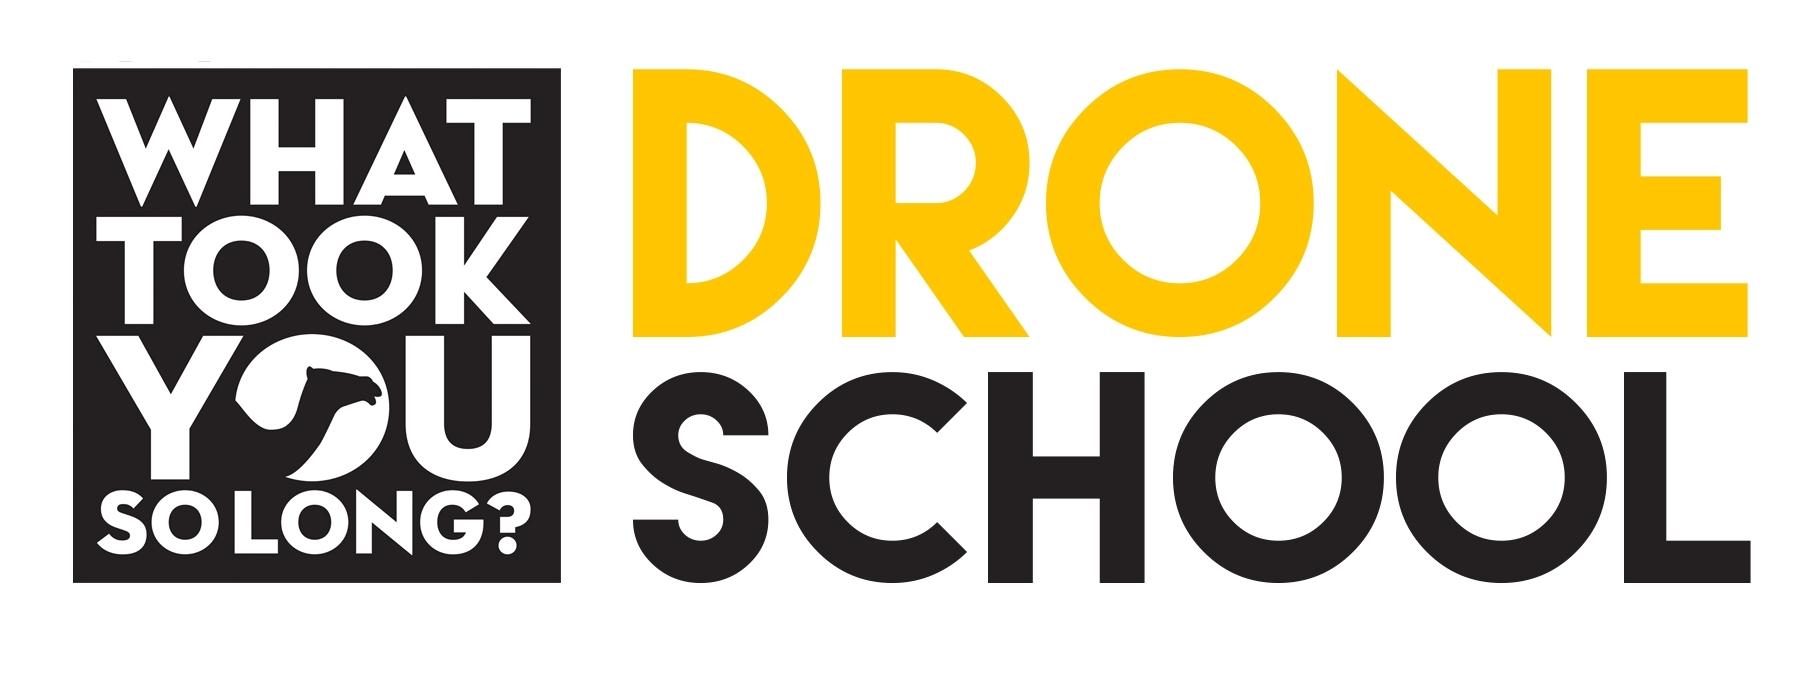 WTYSL_drone_logo.jpg